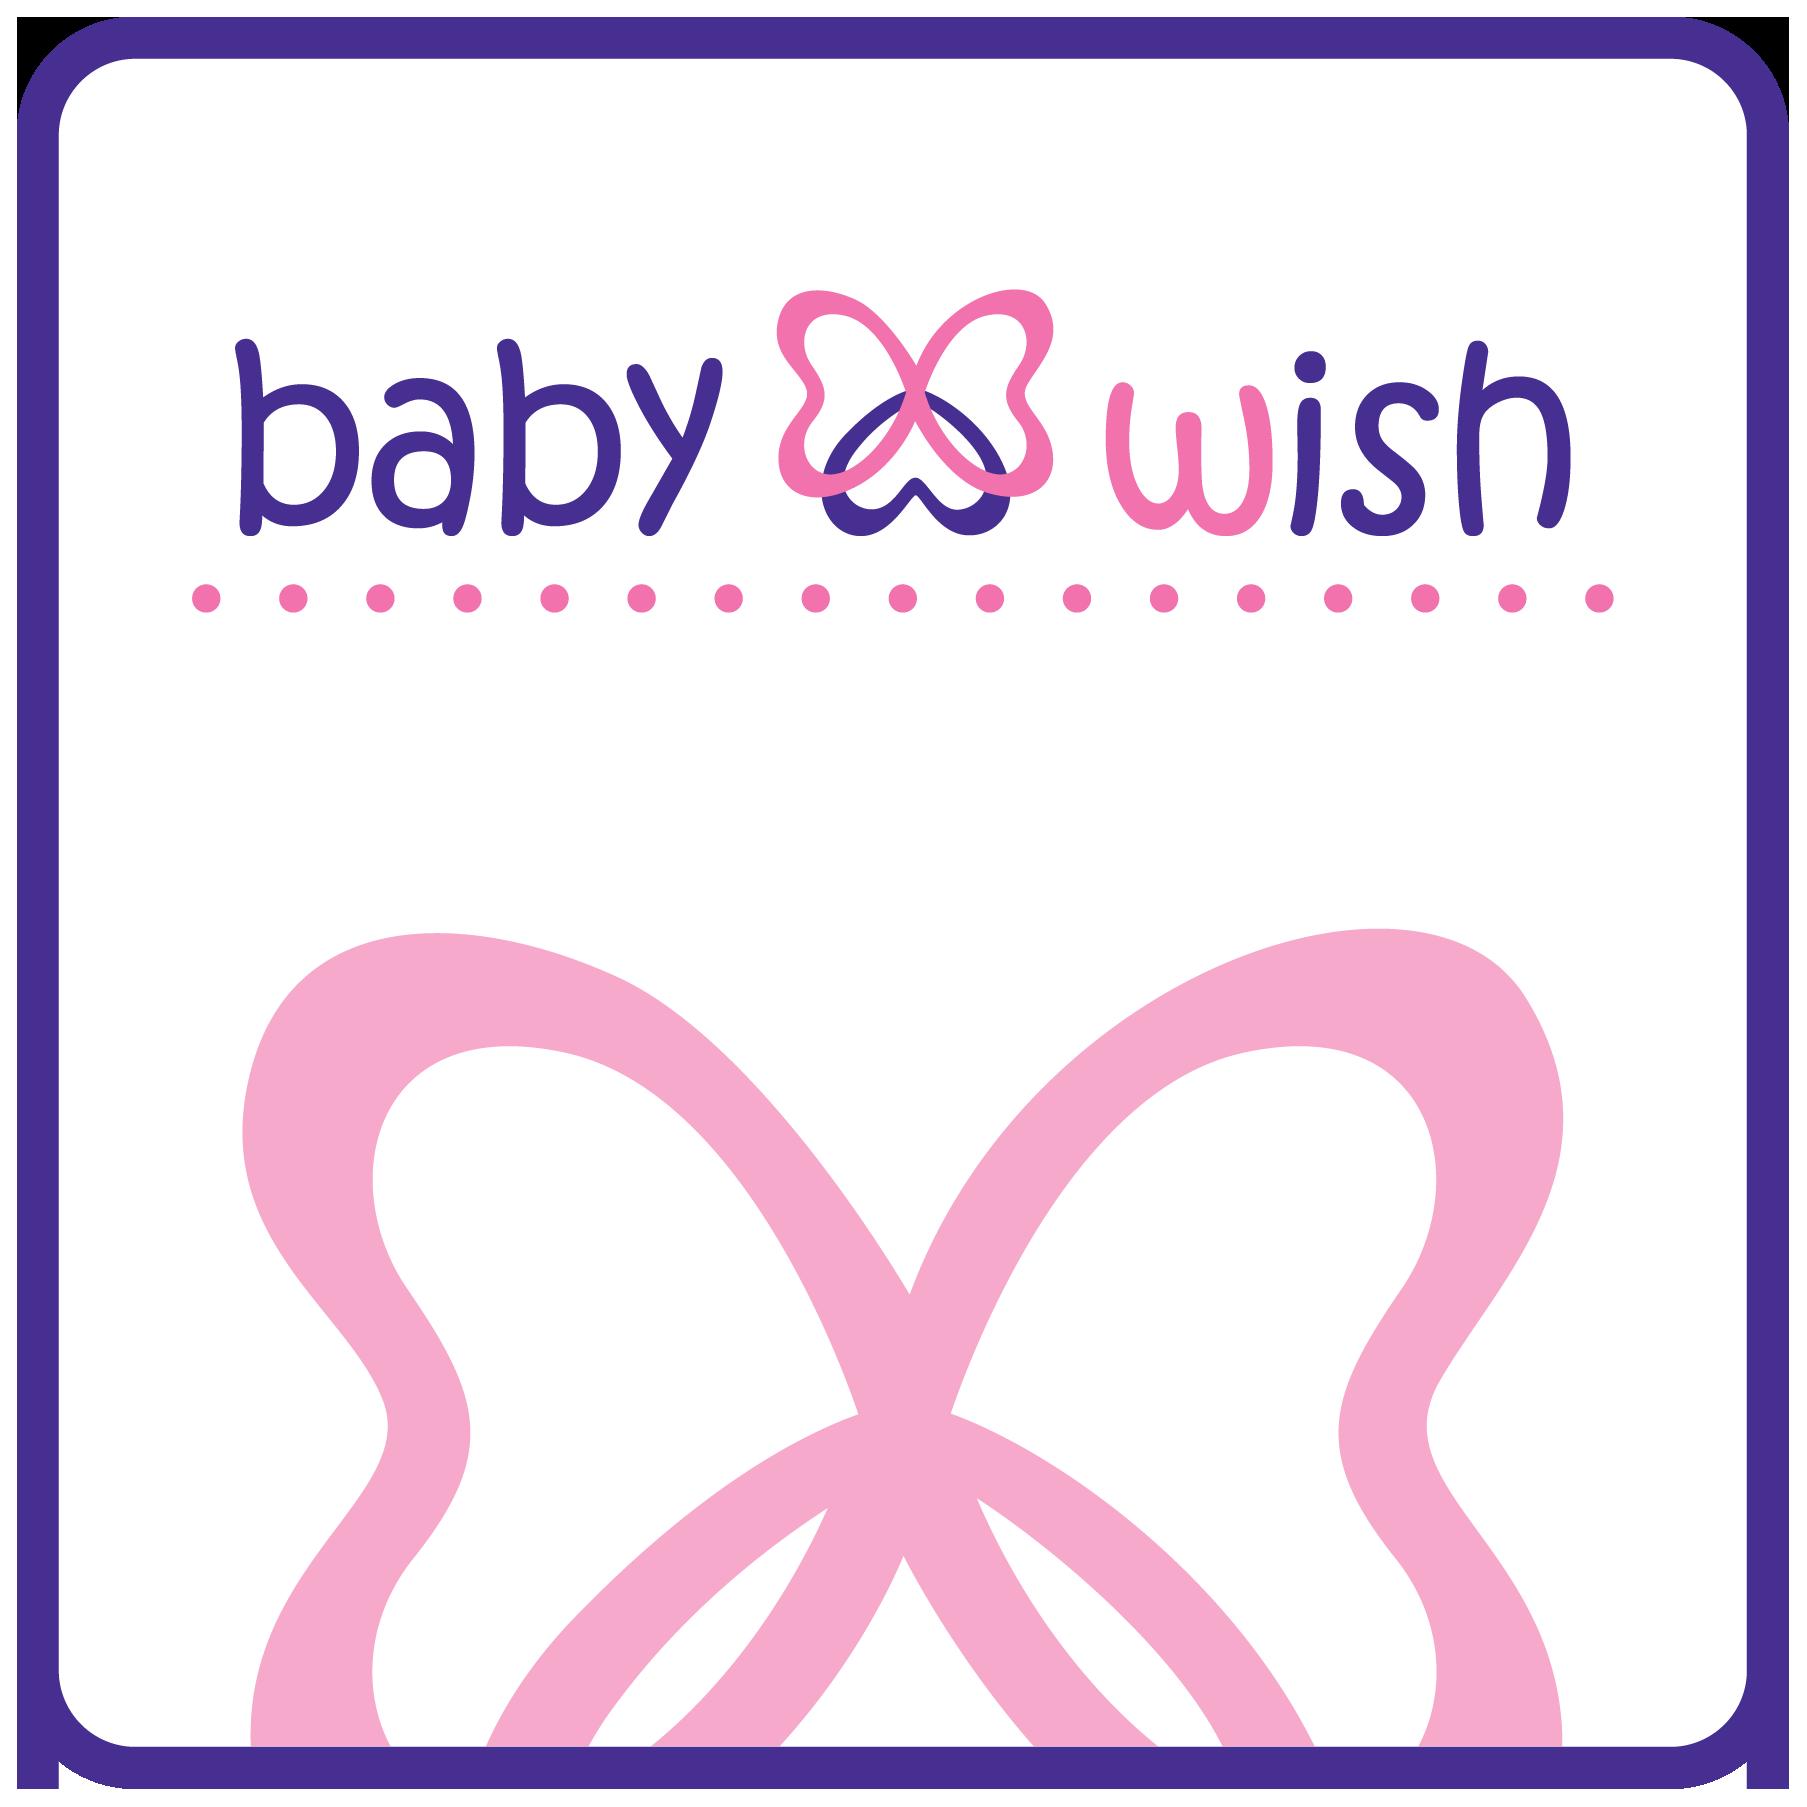 Jual Produk Merchant Baby Wish Terbaru November 2018 Ayunan Bayi Merk Joe Yi